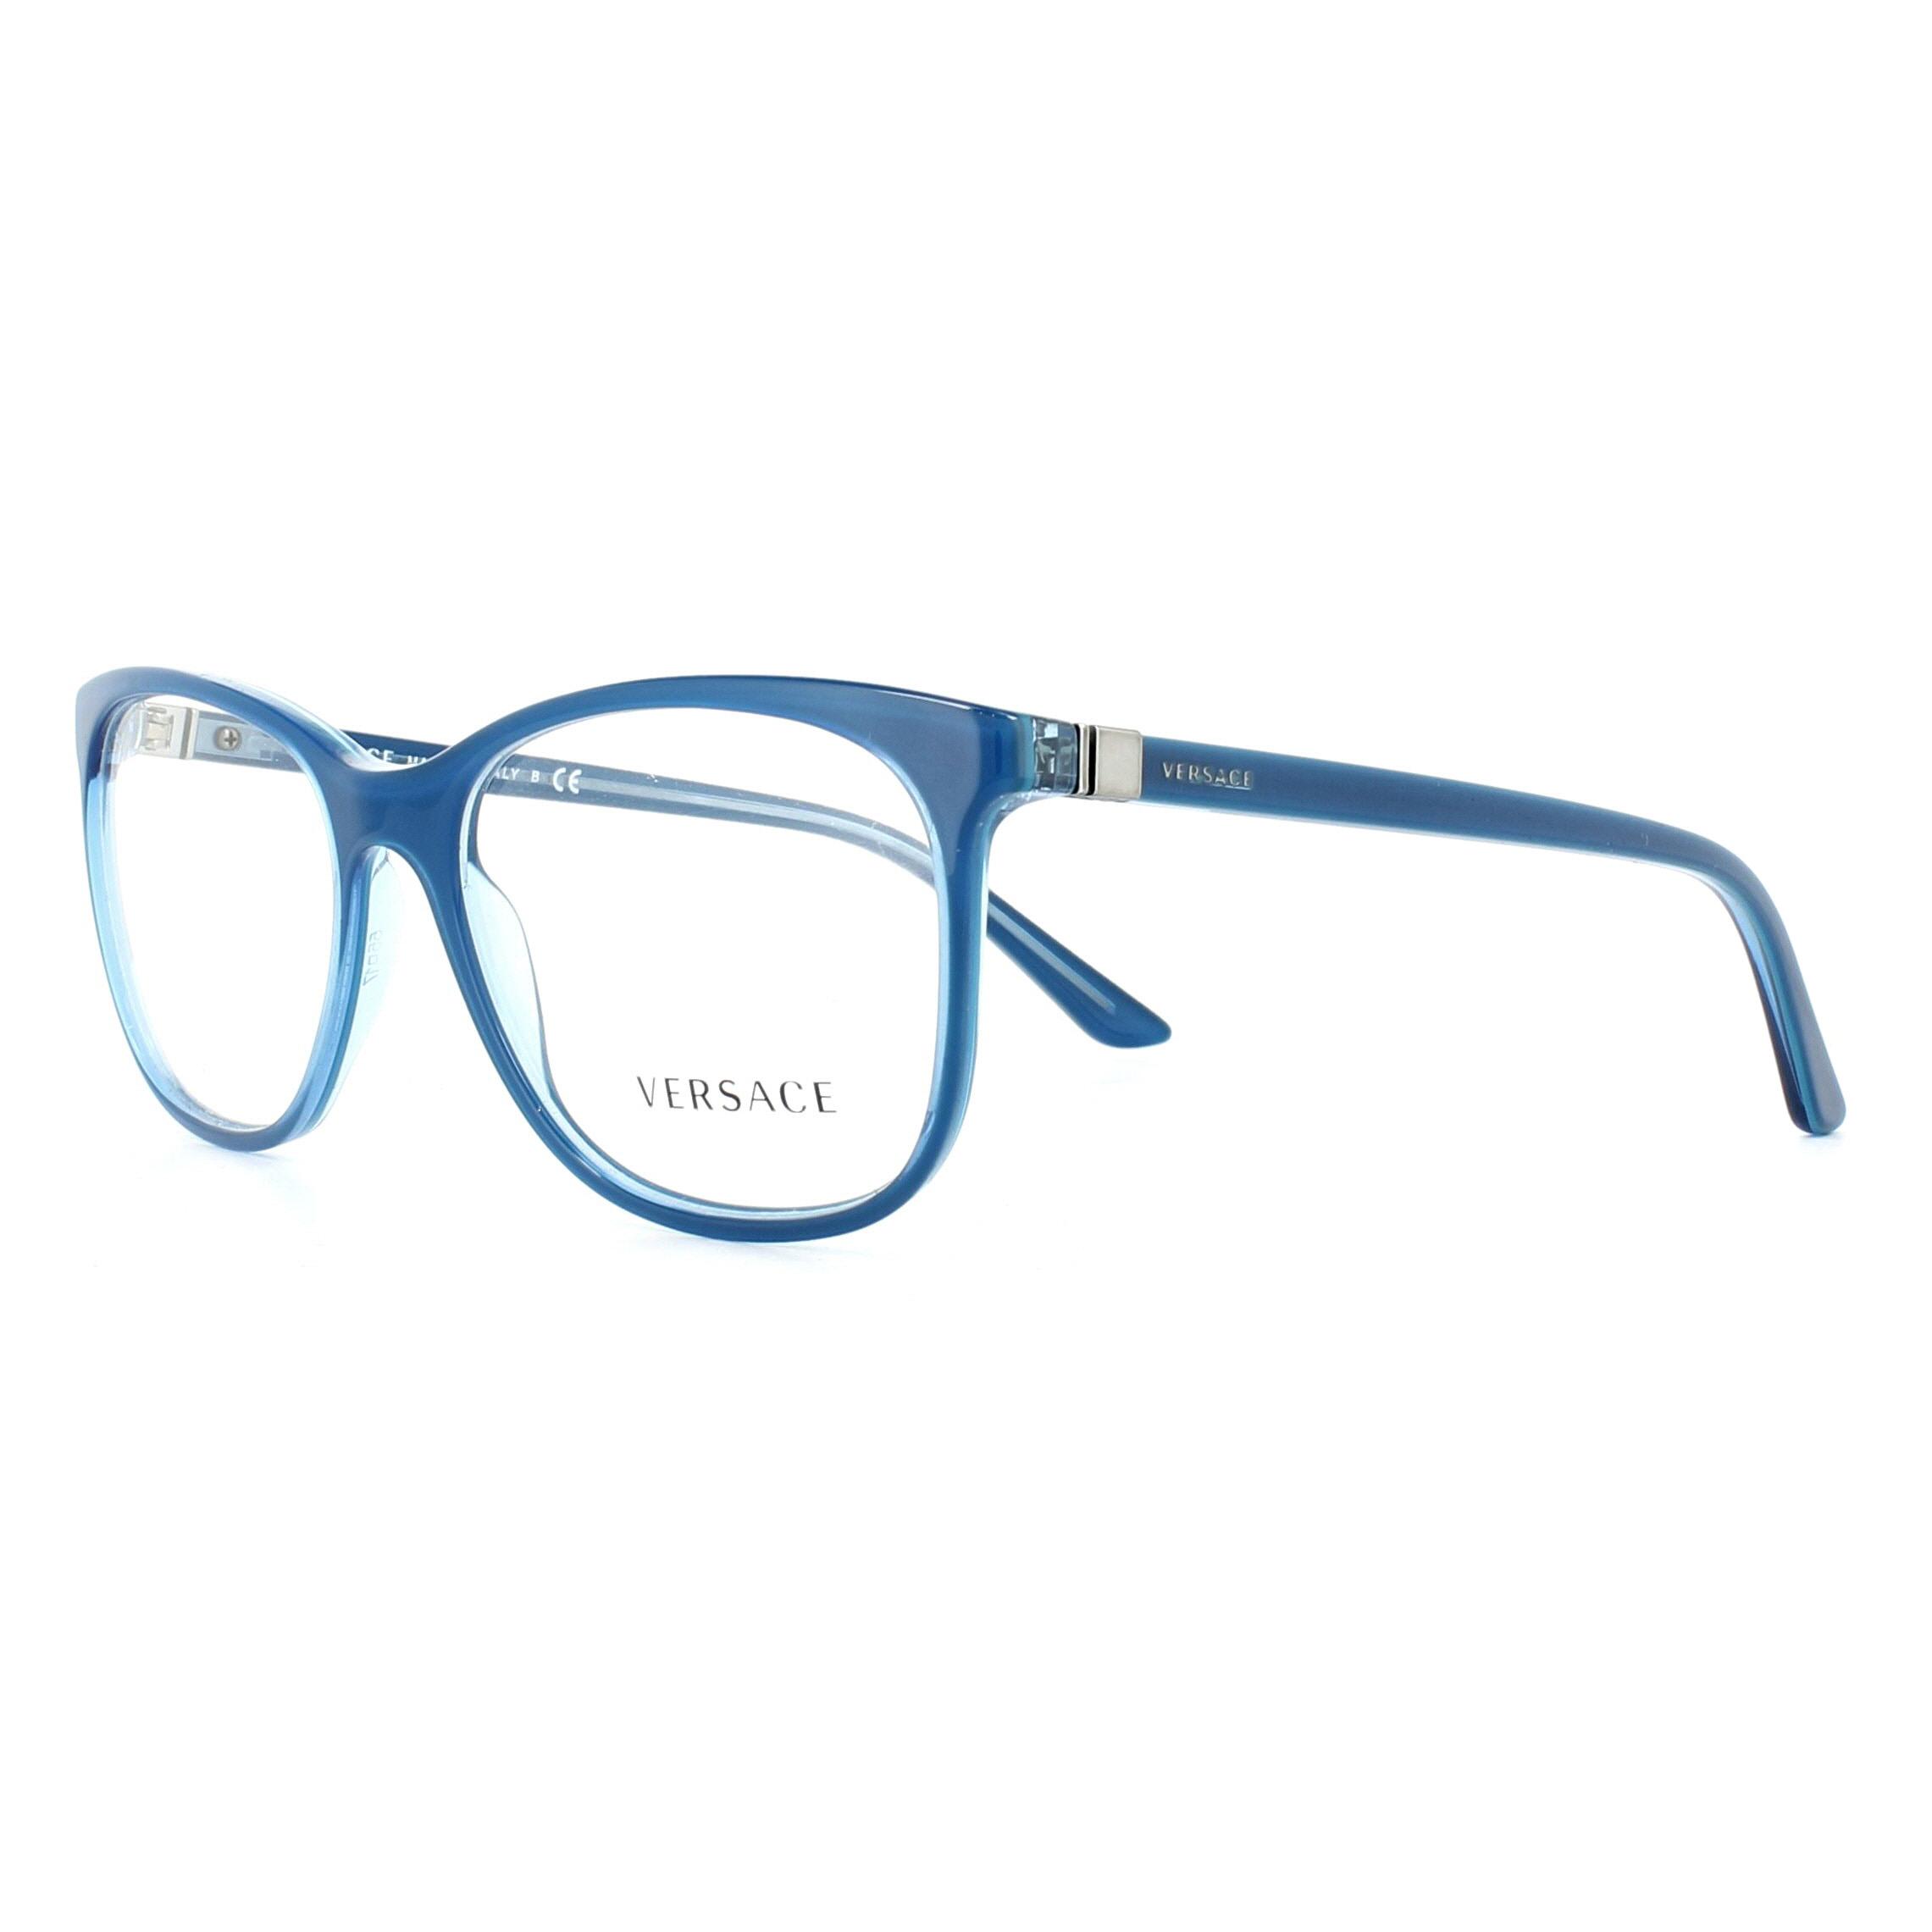 84a234f71070 Sentinel Versace Glasses Frames 3187 5056 Blue Transparent Azure 55mm Womens